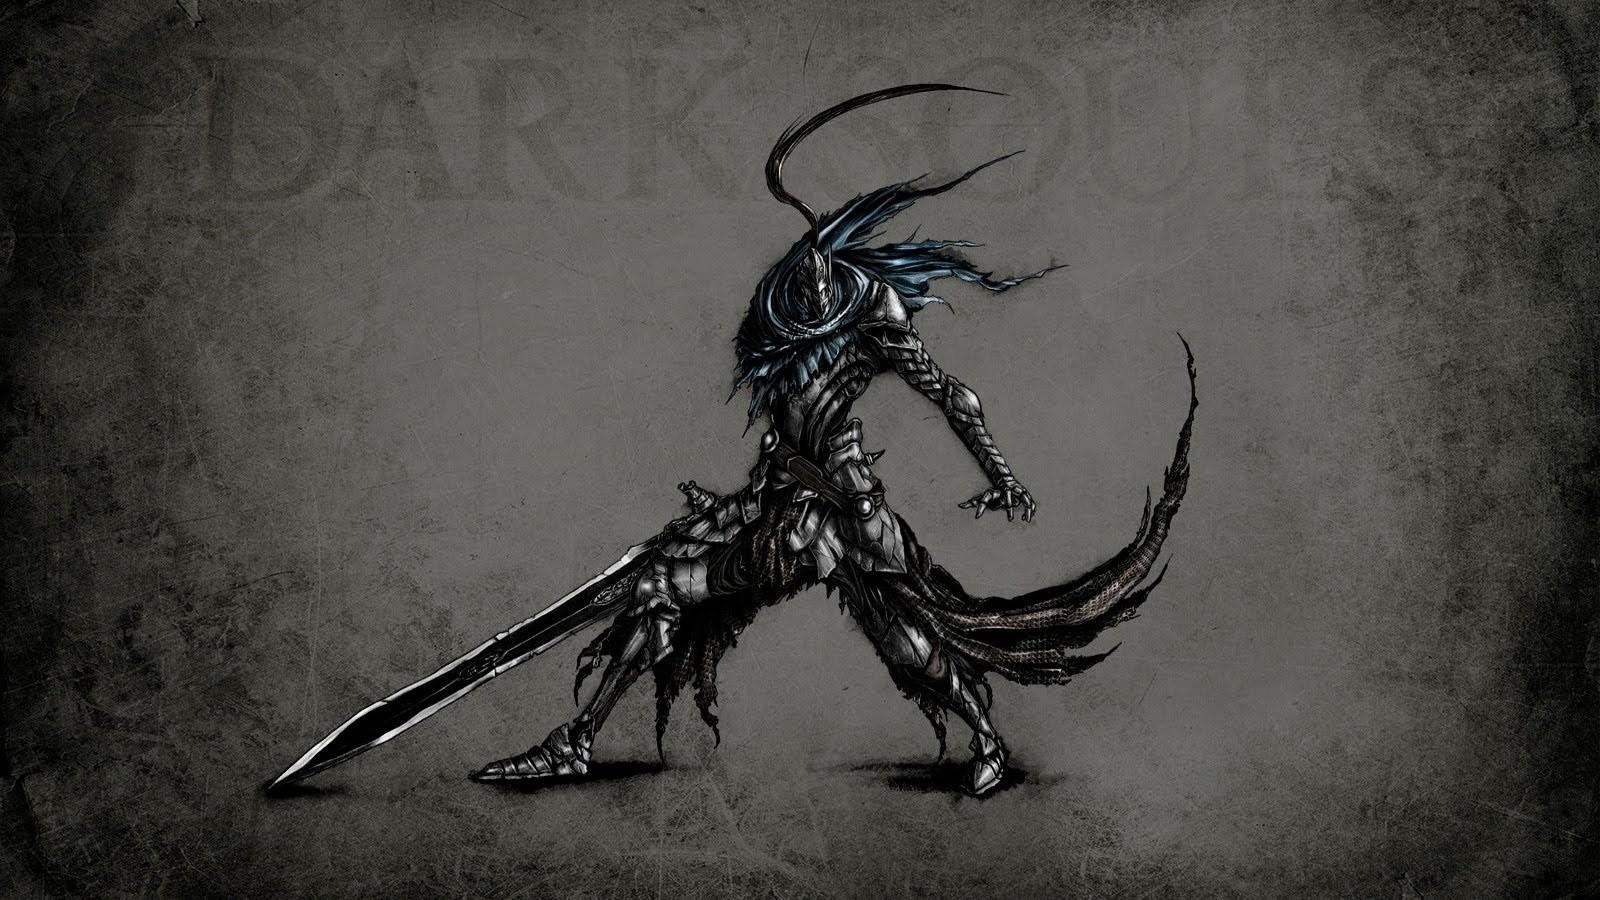 Wallpaper : drawing, illustration, video games, Dark Souls